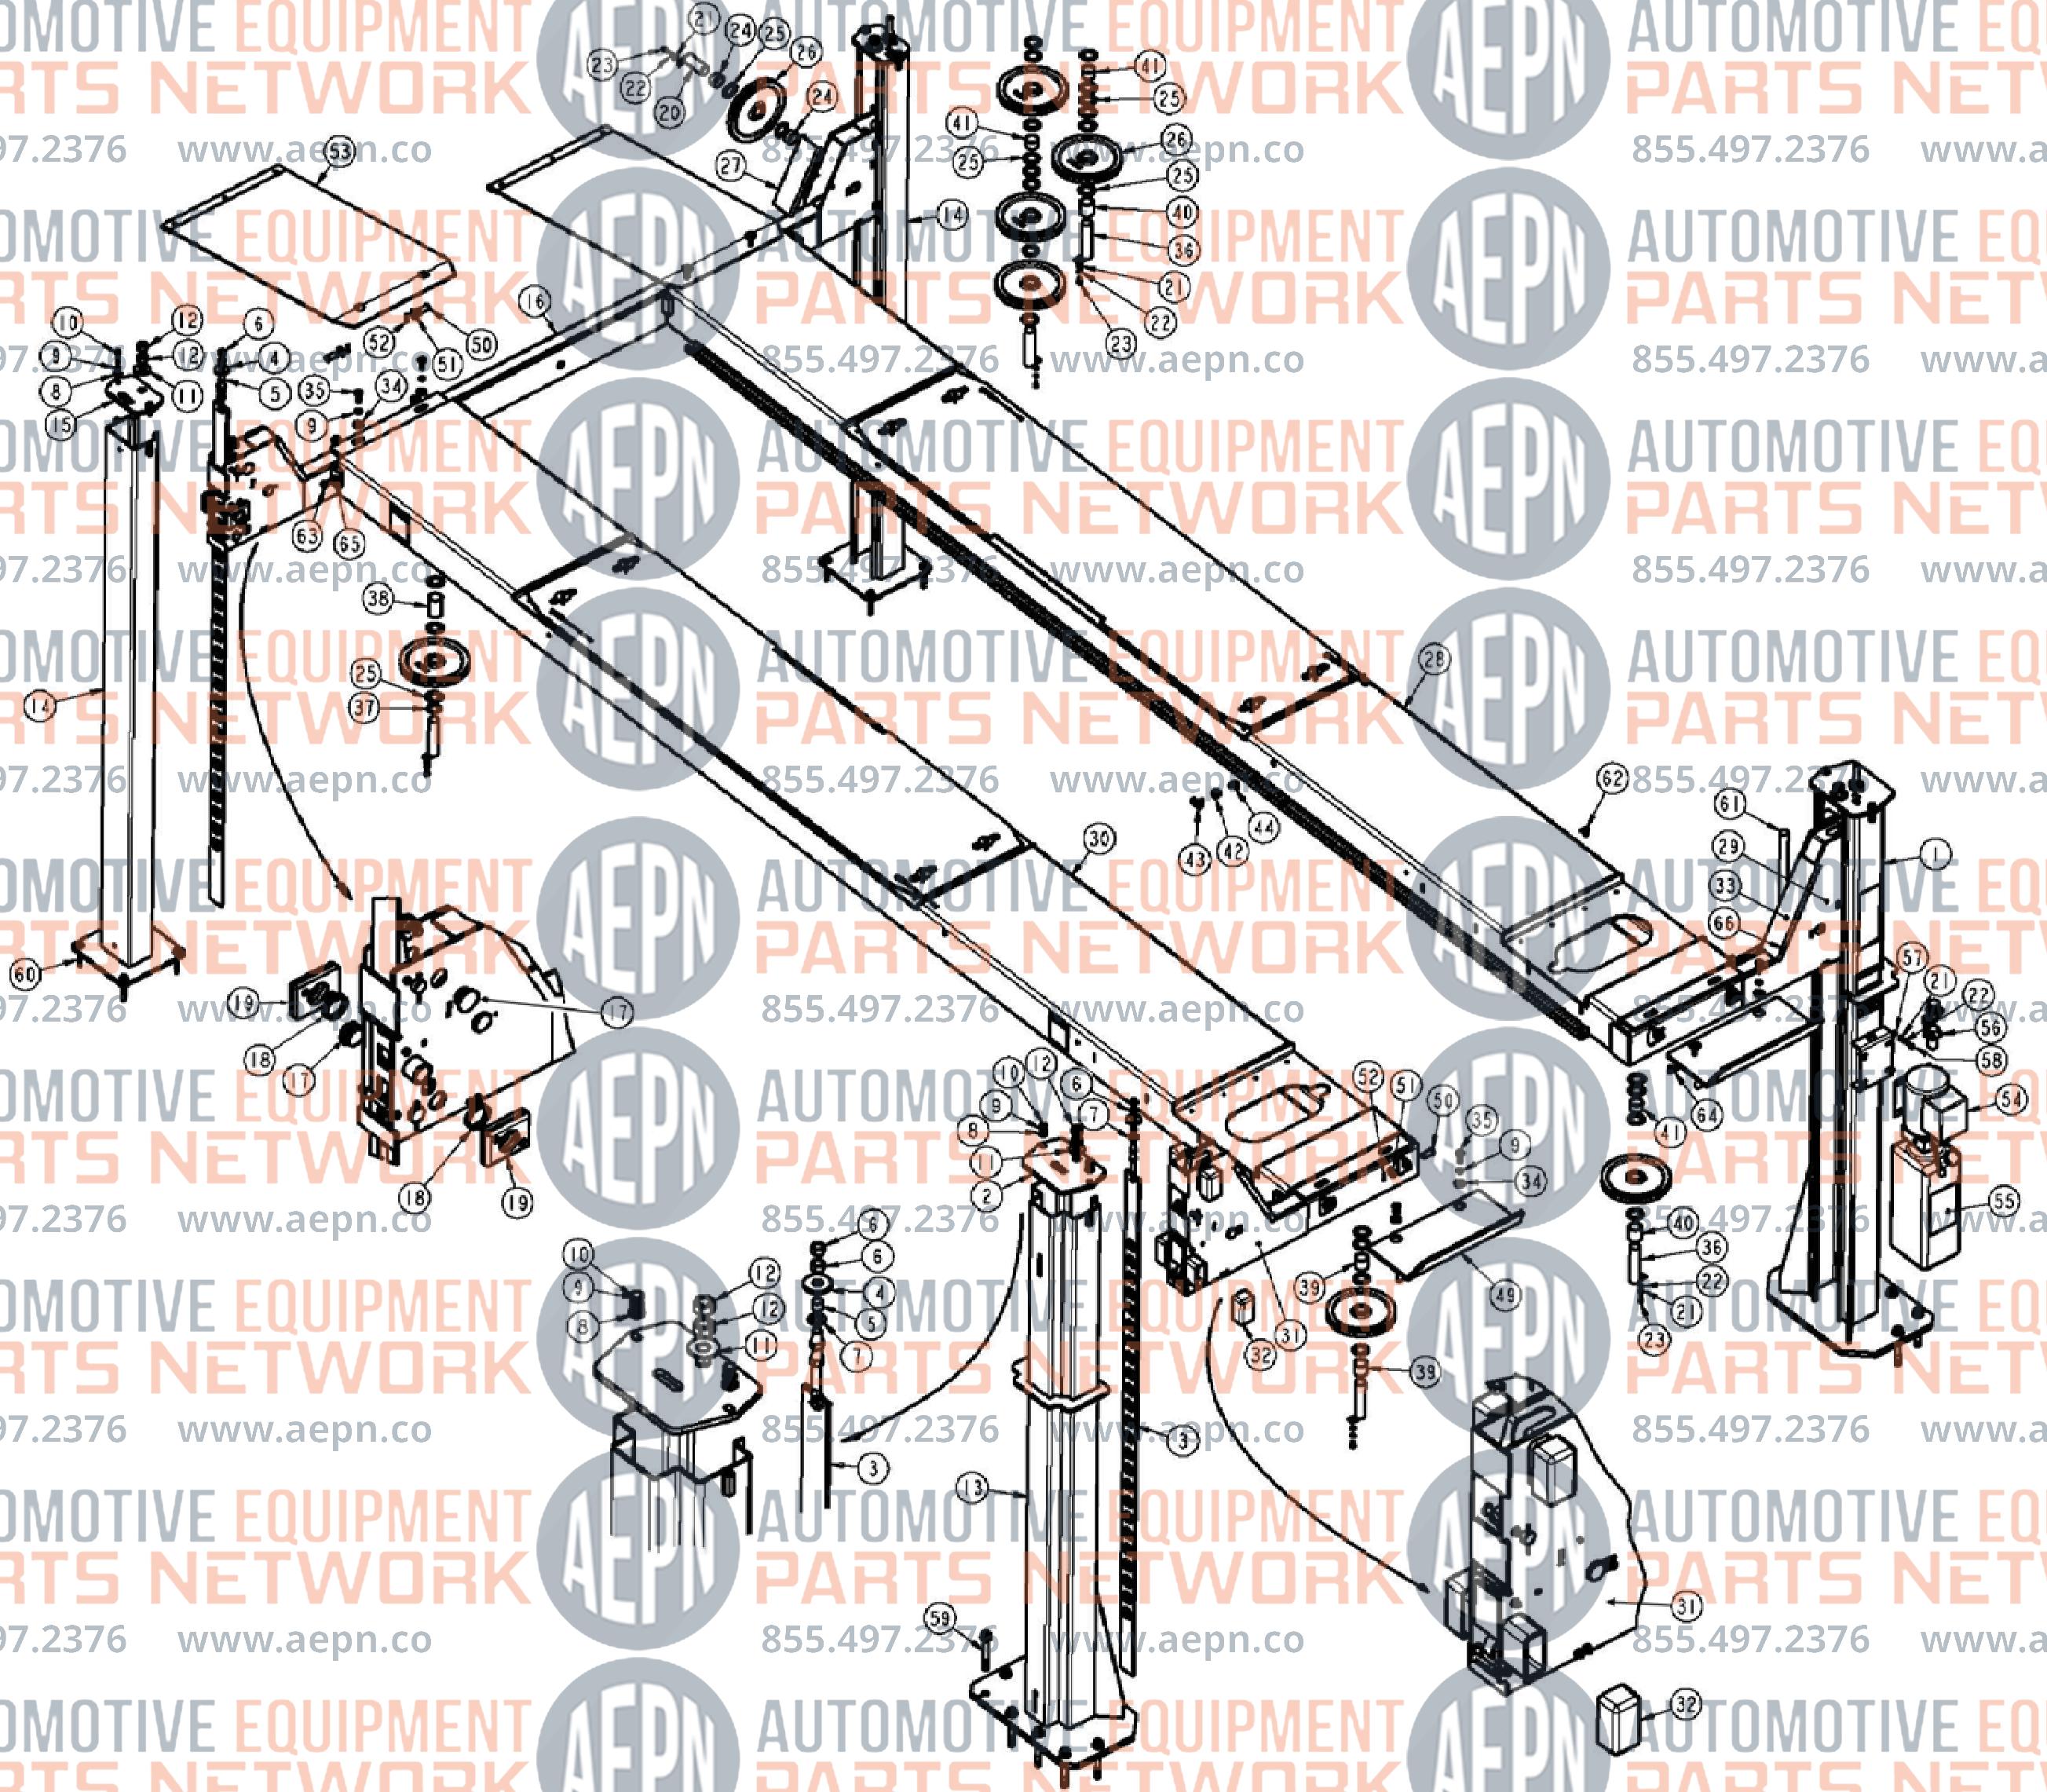 JOHN BEAN EELR507A Parts BreakdownAutomotive Equipment Parts Network